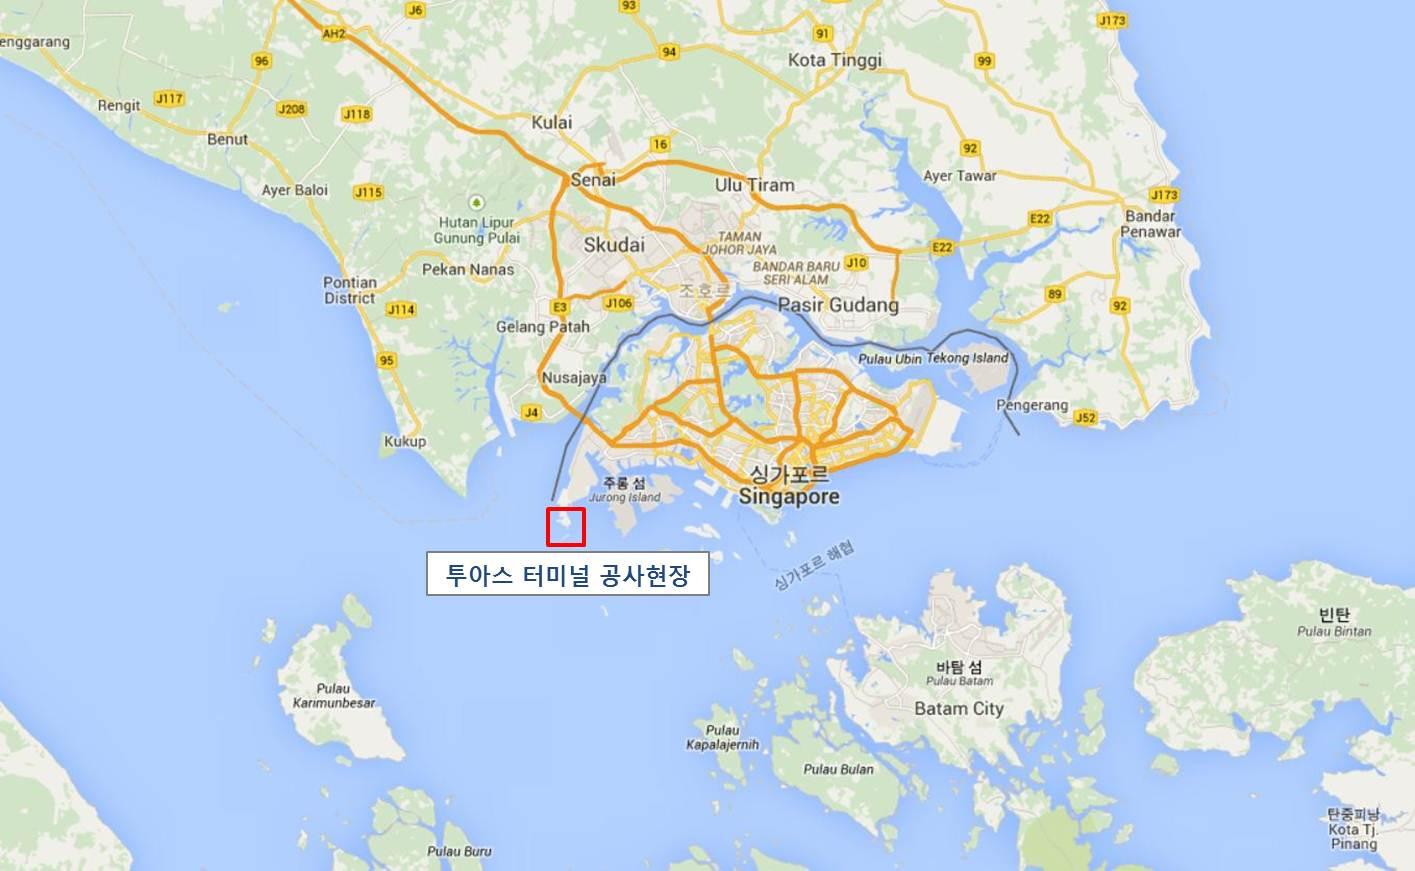 Tuas Park area map. - Image - Pharmaceutical Technology